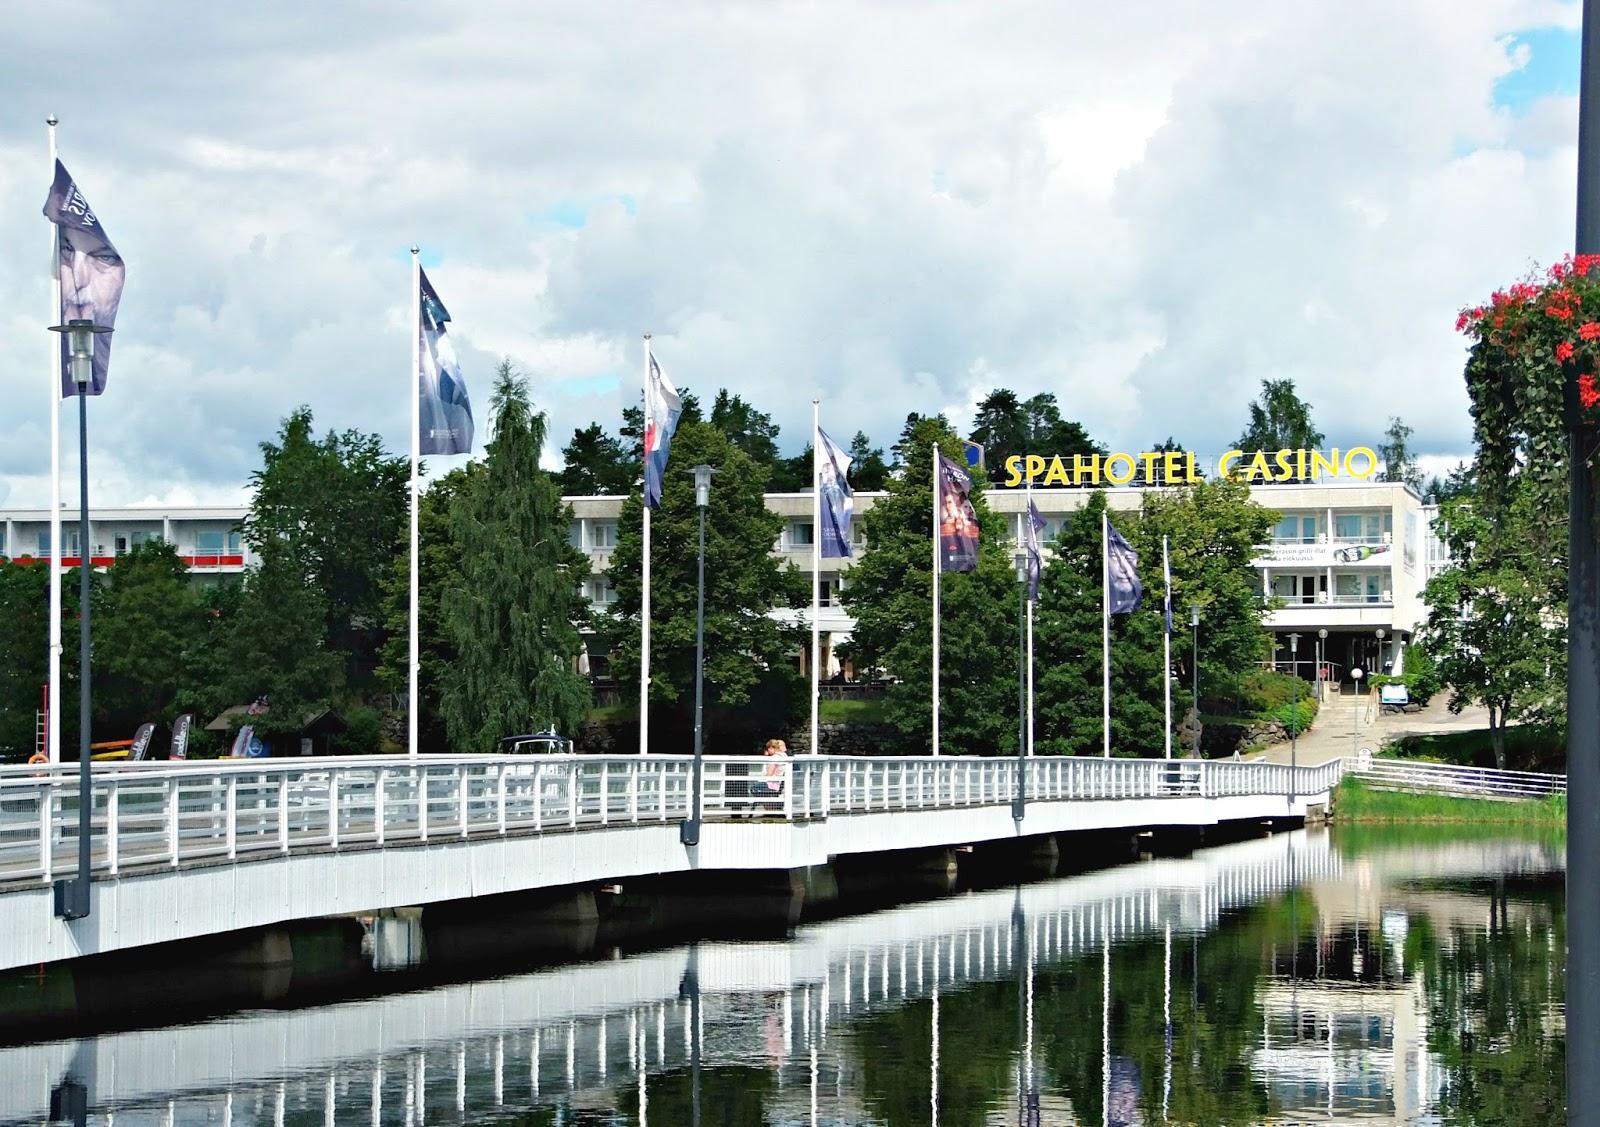 Spa Hotel Casino Savonlinna